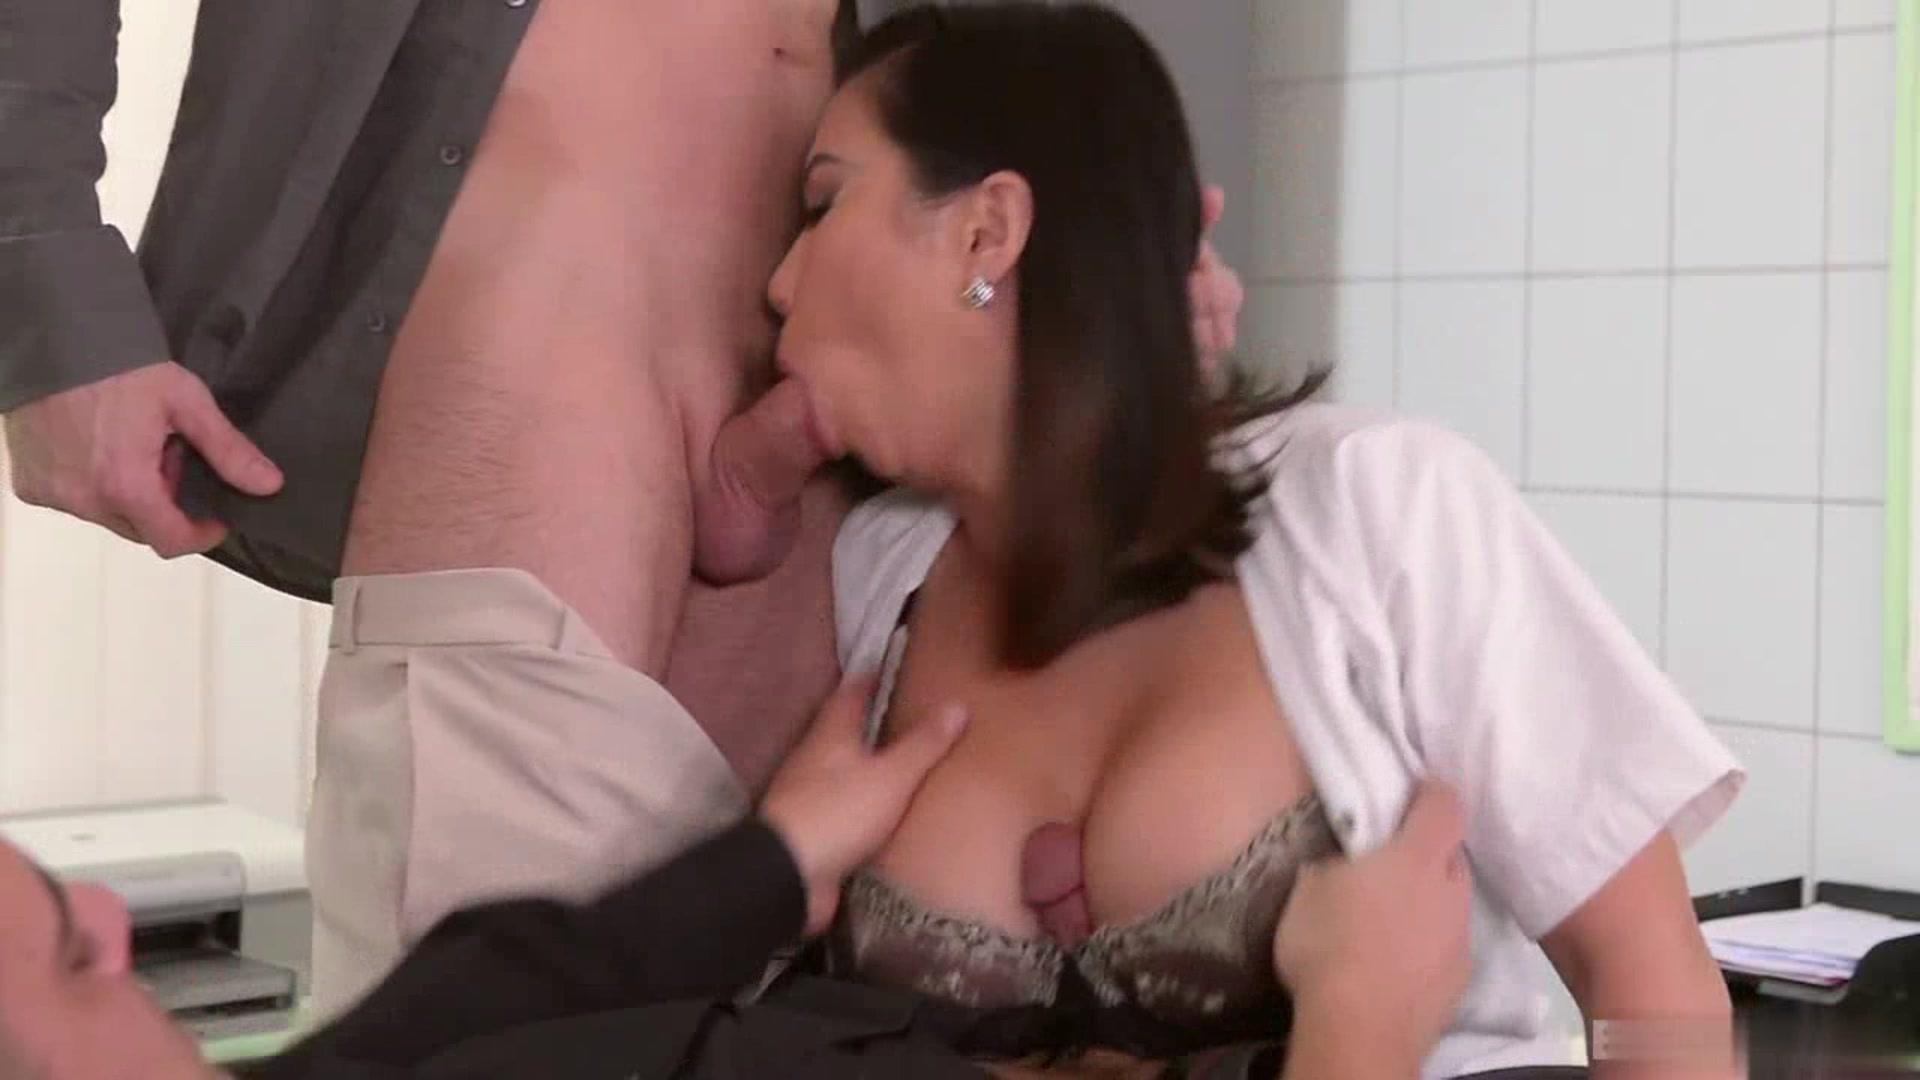 Dicks sucking two Kinky whore